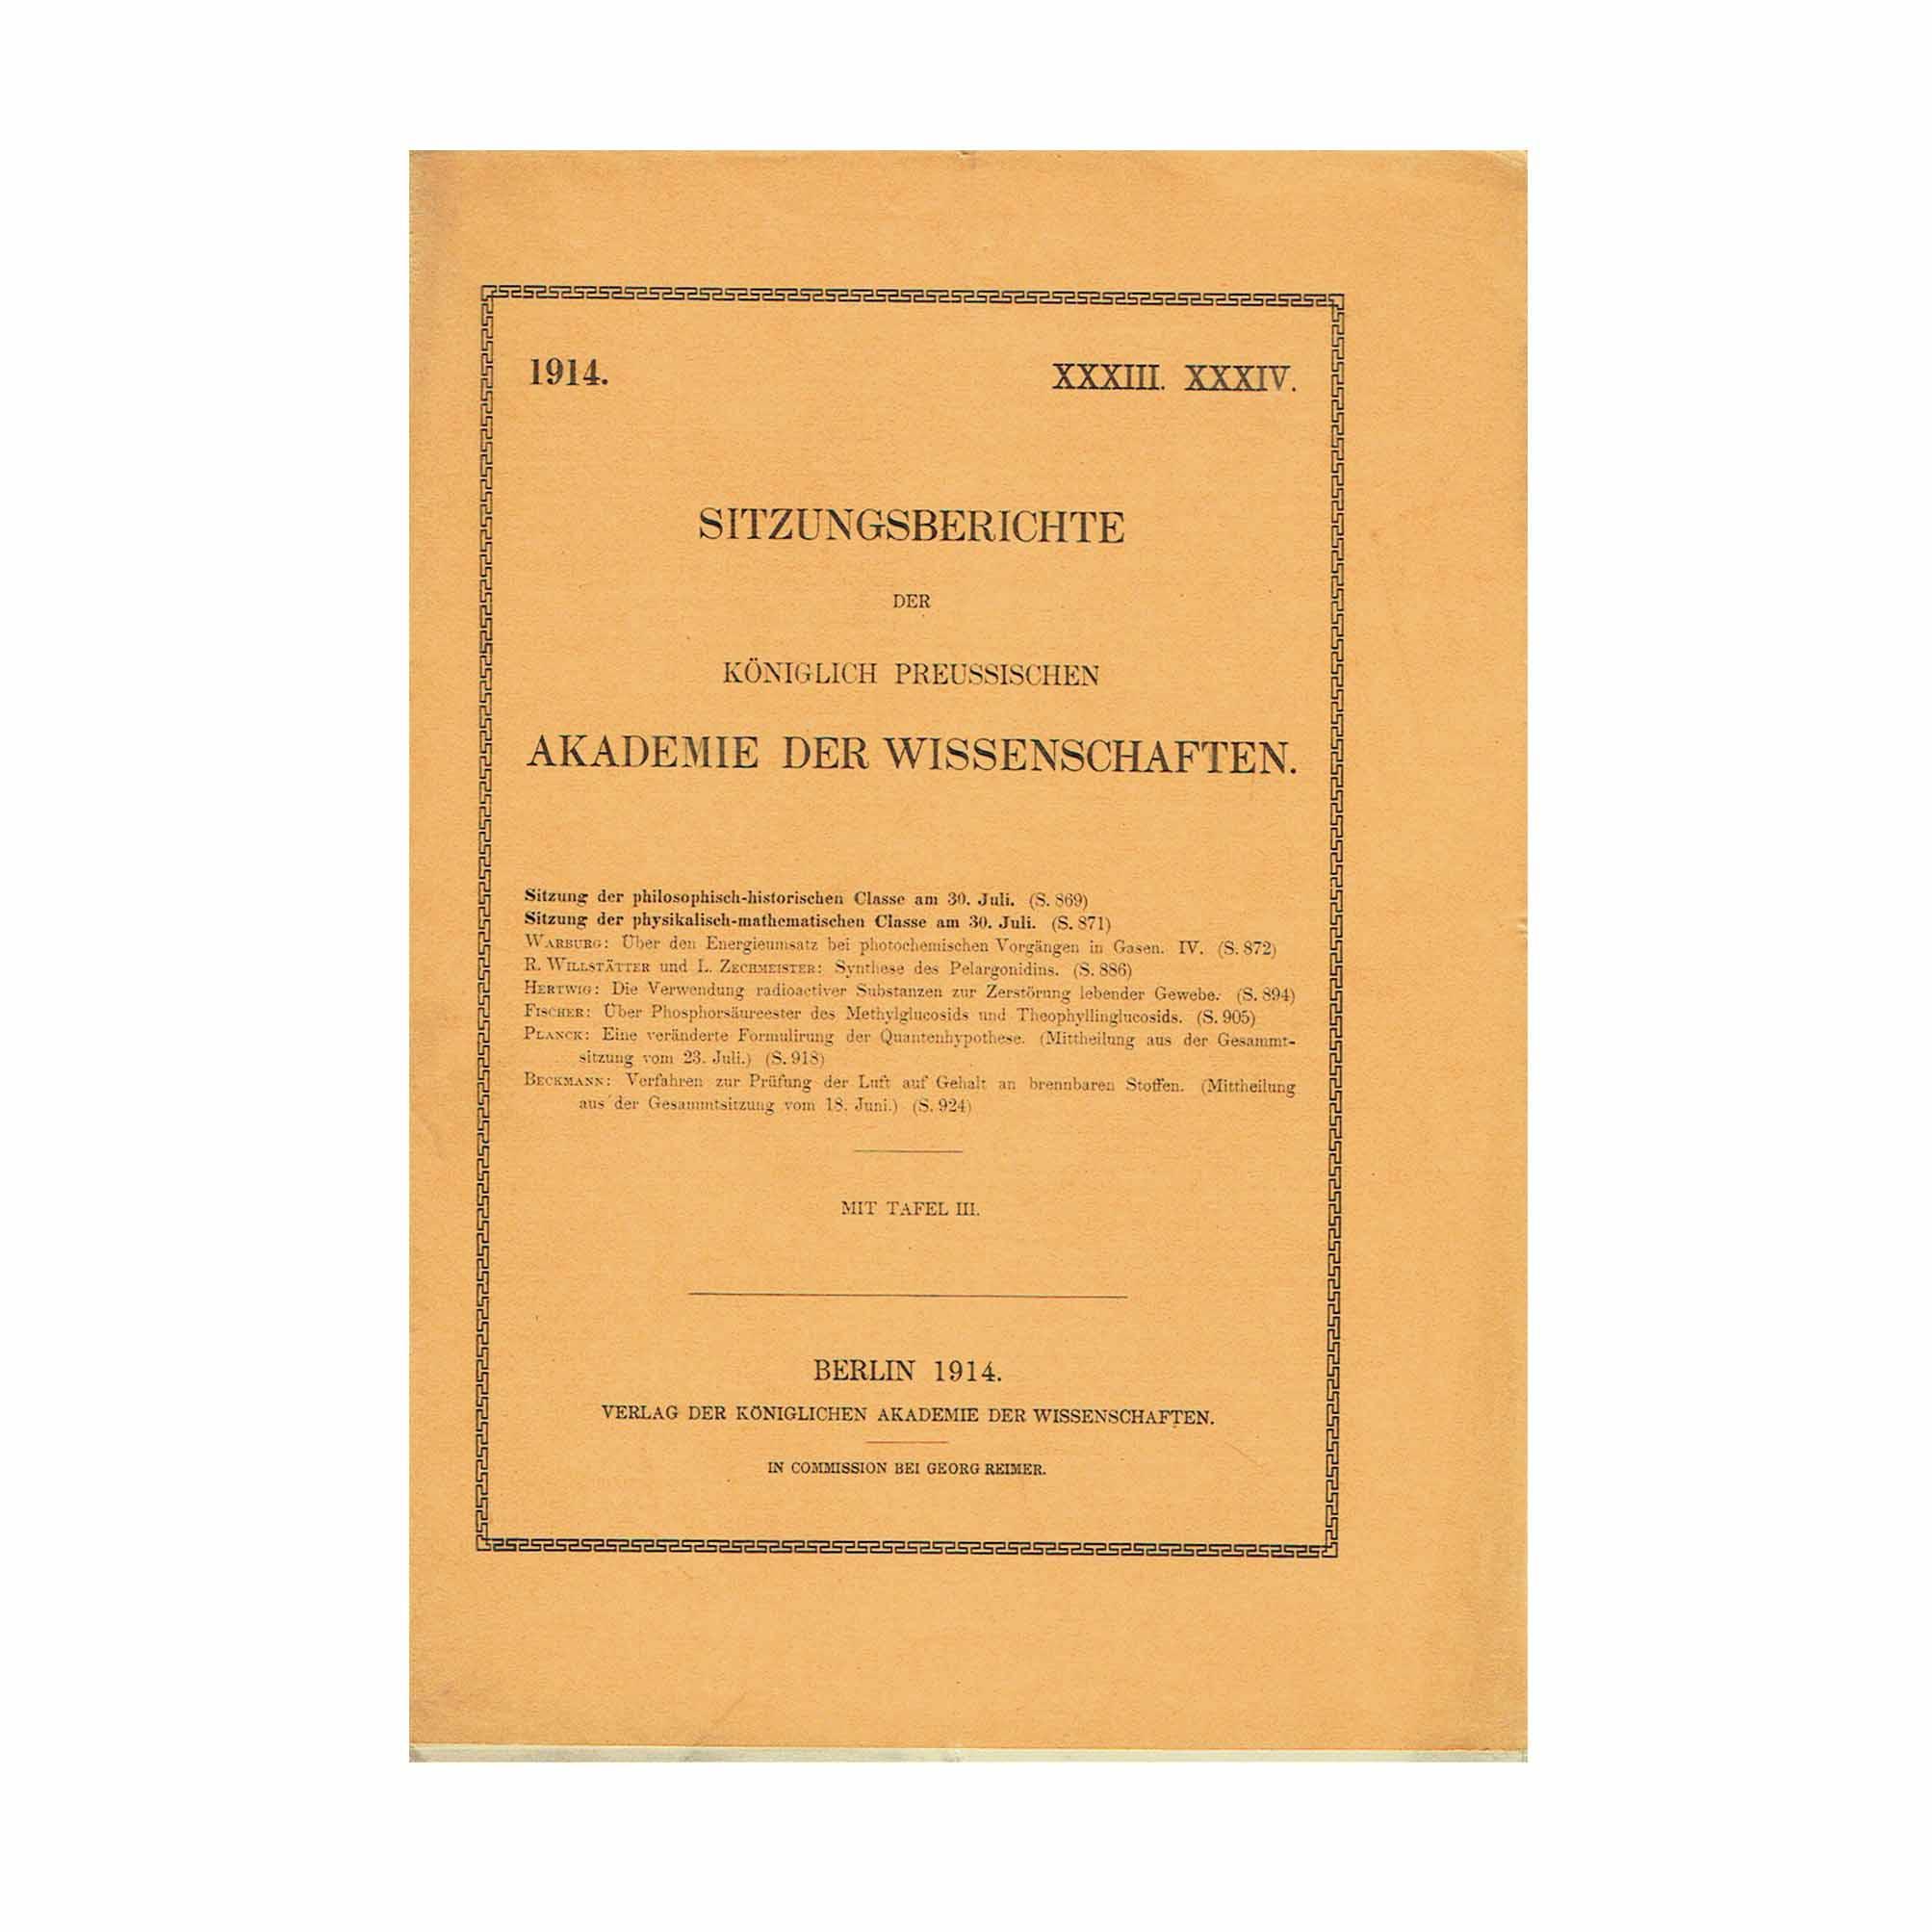 5818K-Planck-Veraenderte-Quantenhypothese-First-Separate-1914-Front-Cover-N.jpg